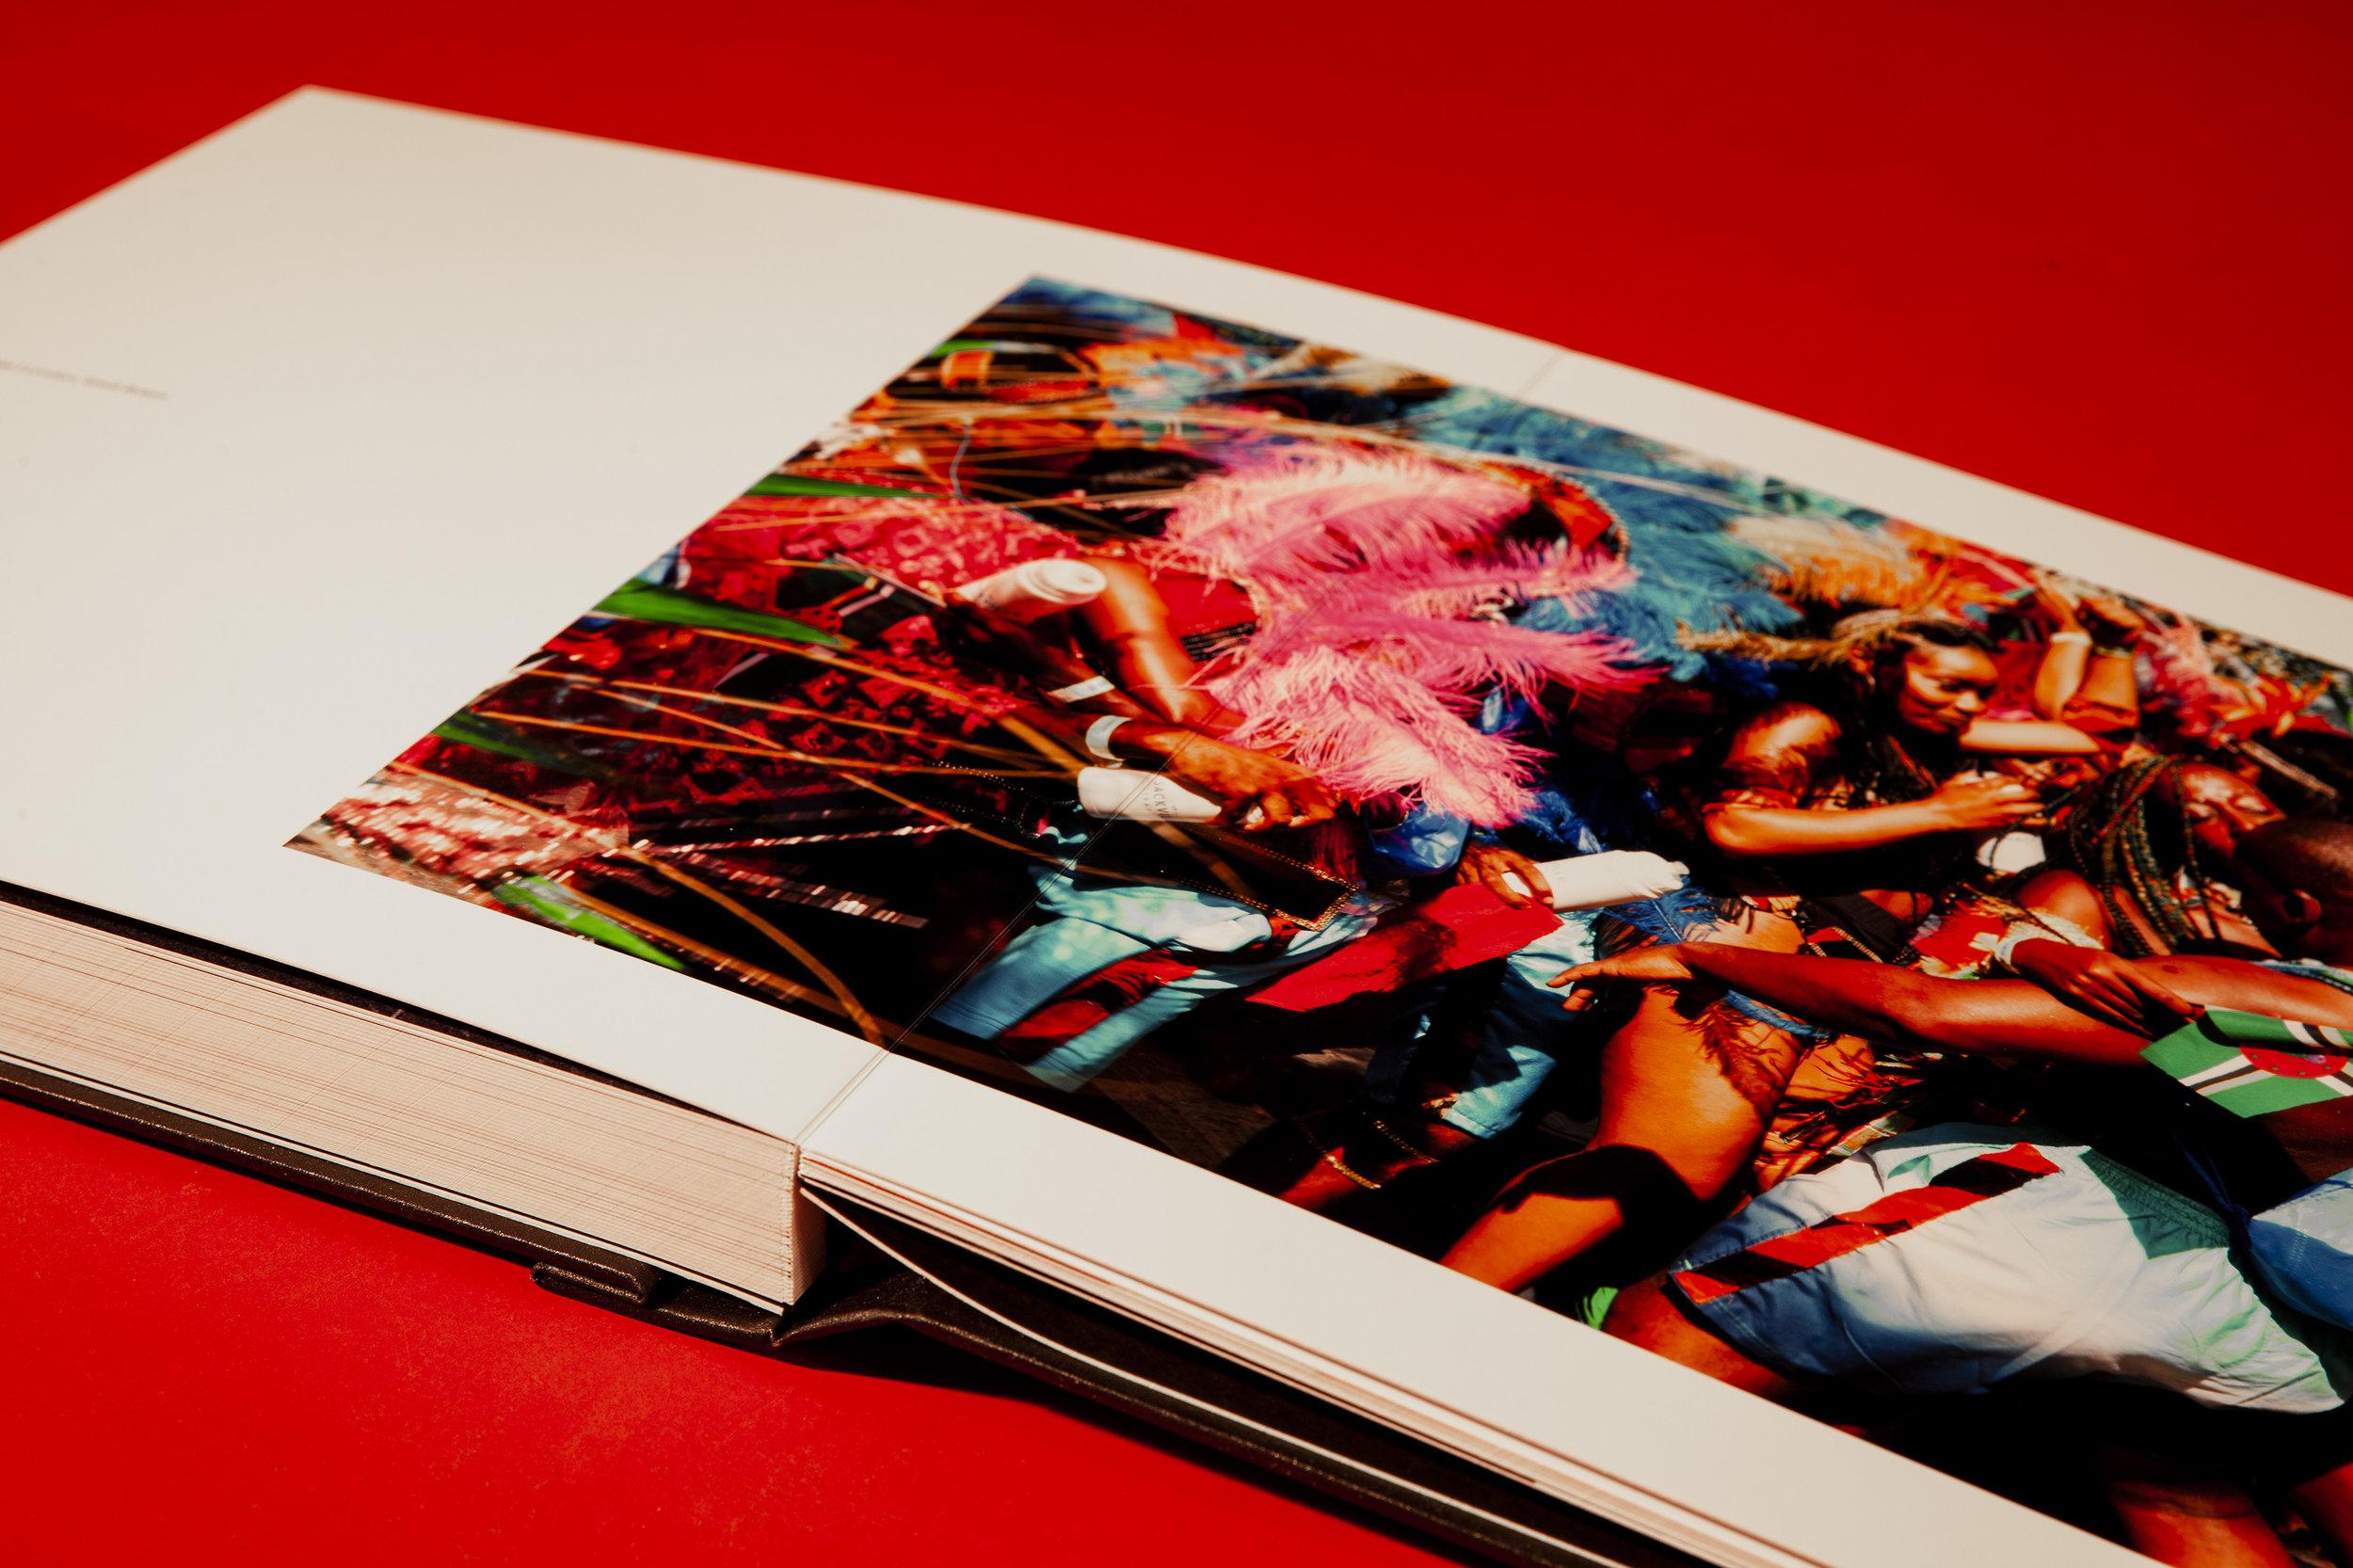 magnum-by-magnum-book14.jpg